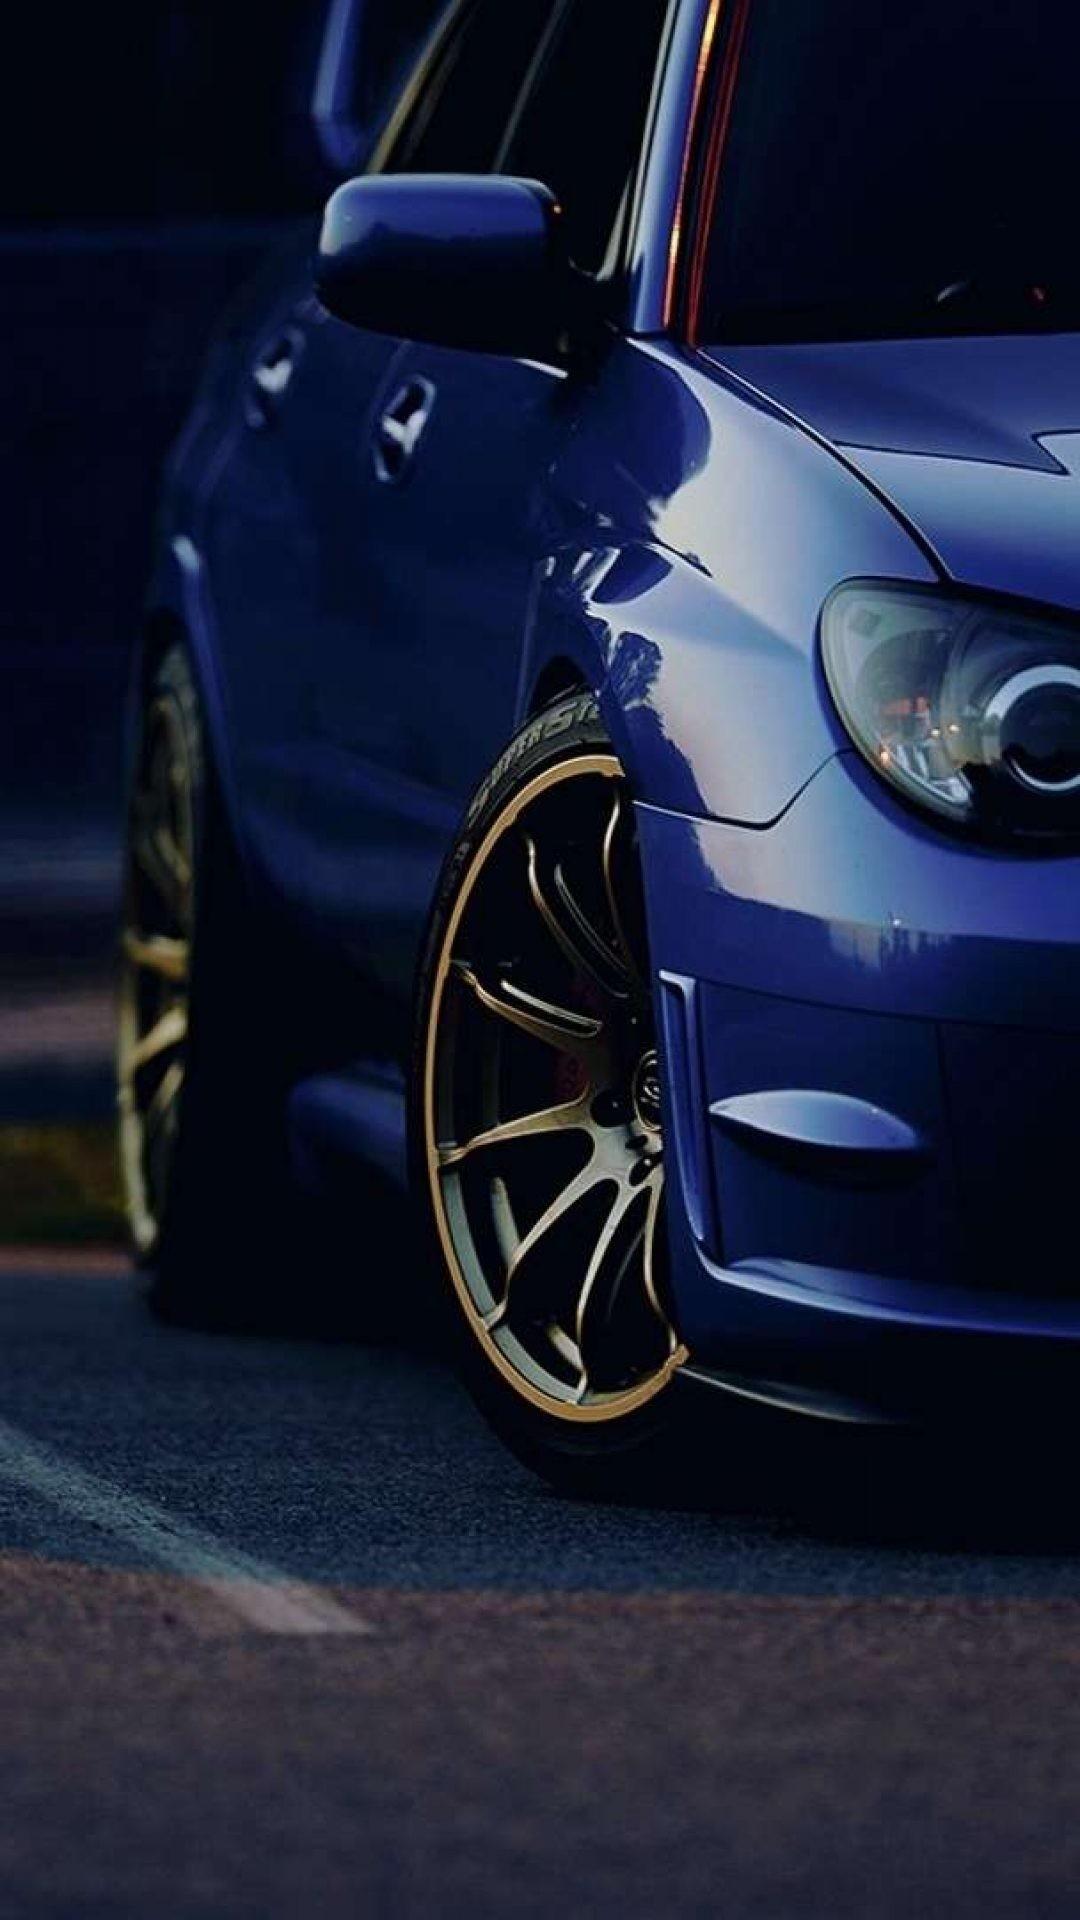 Subaru Impreza Wrx Sti Wallpaper Hd